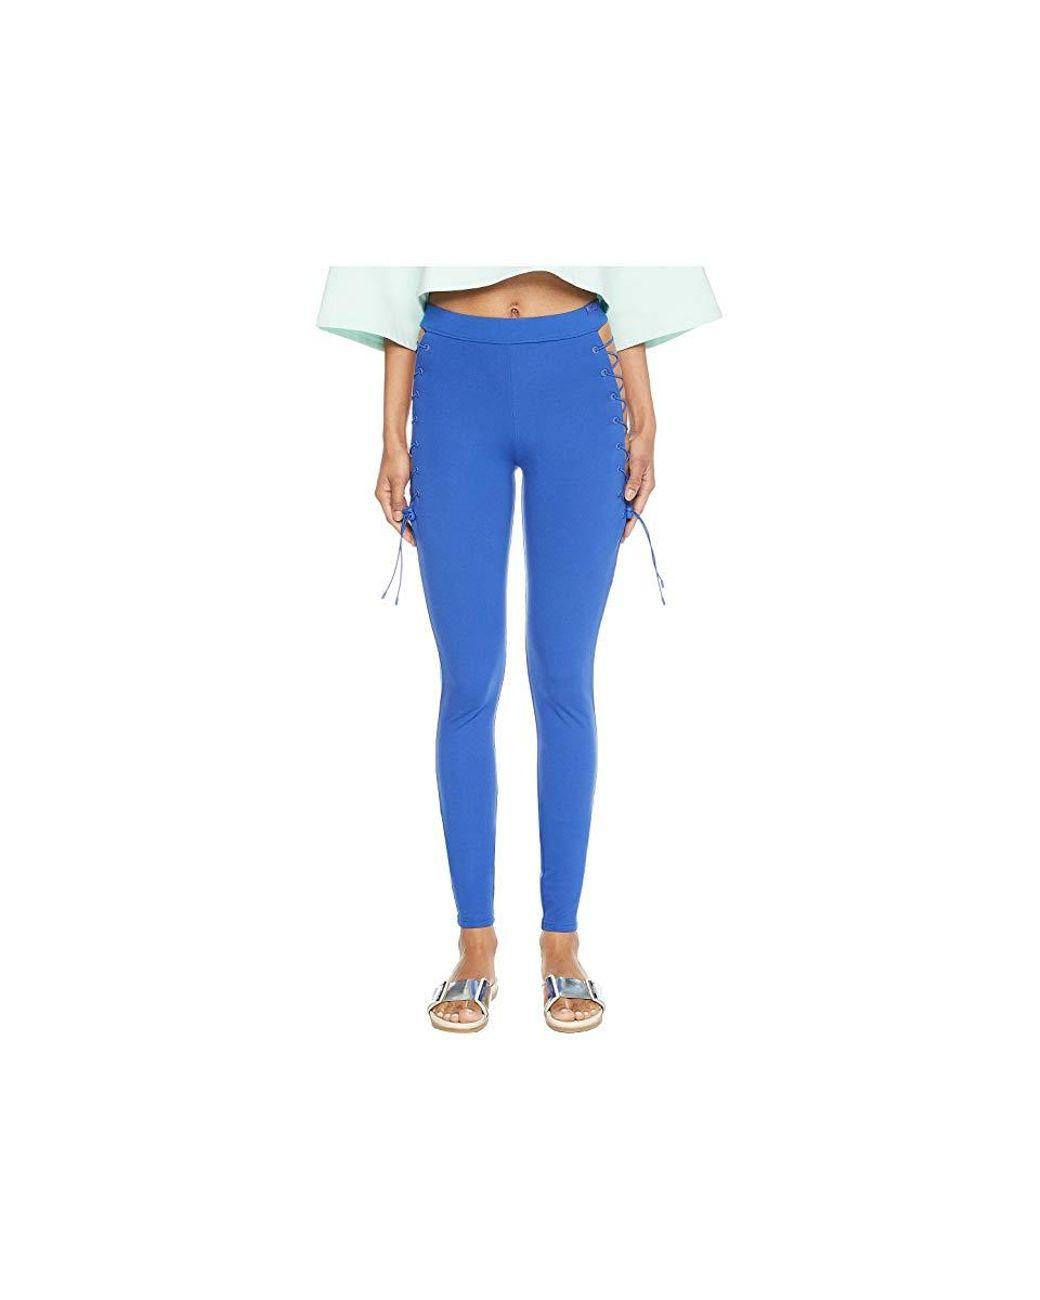 d3ceb2efcde PUMA X Fenty By Rihanna Side Lace Leggings (dazzling Blue) Casual Pants in  Blue - Save 65% - Lyst